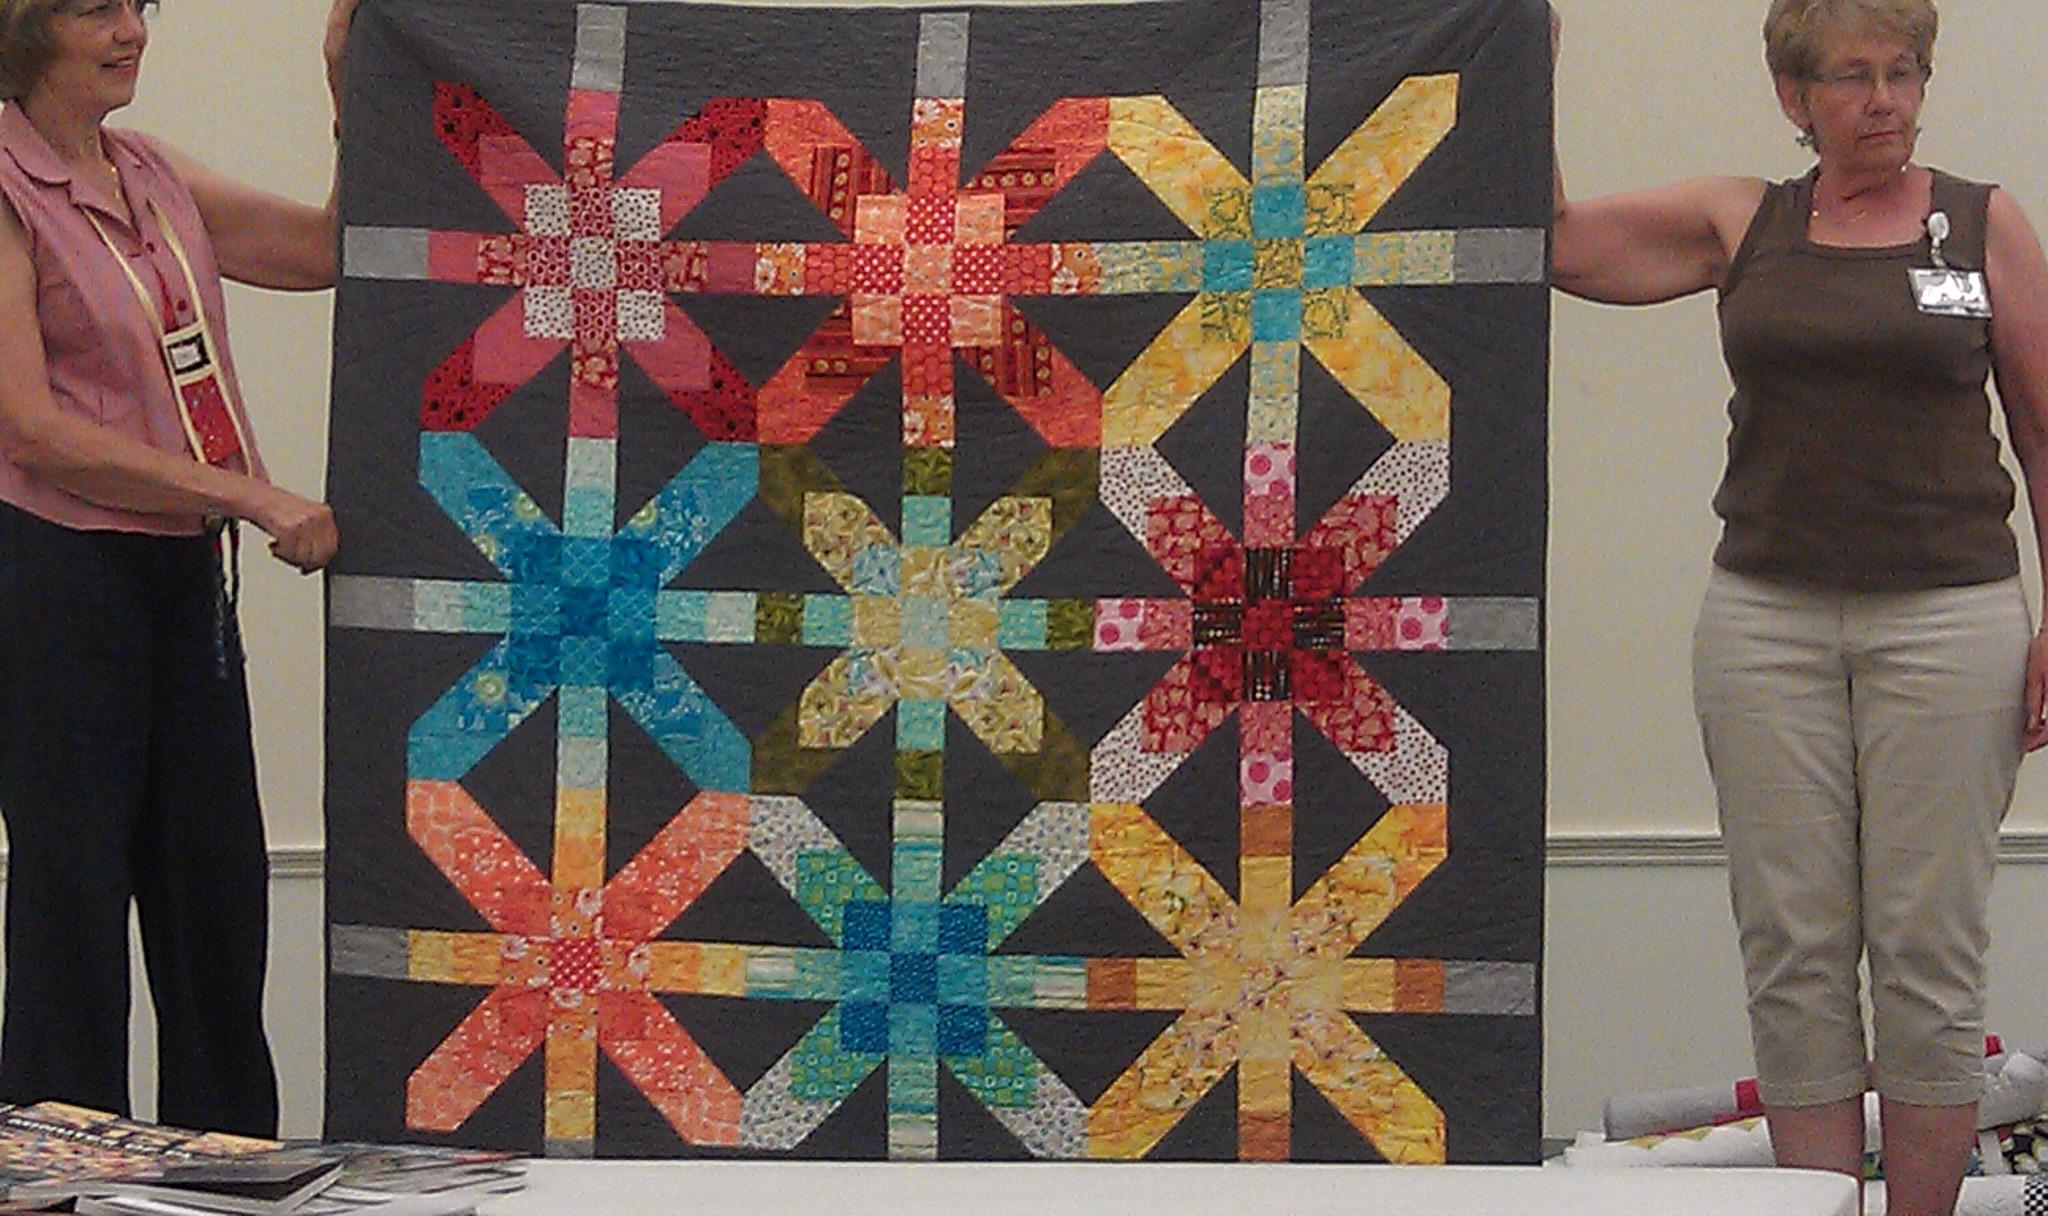 Baby Shoofly - Dragonfly Quiltworks : quilt shops in ocala fl - Adamdwight.com